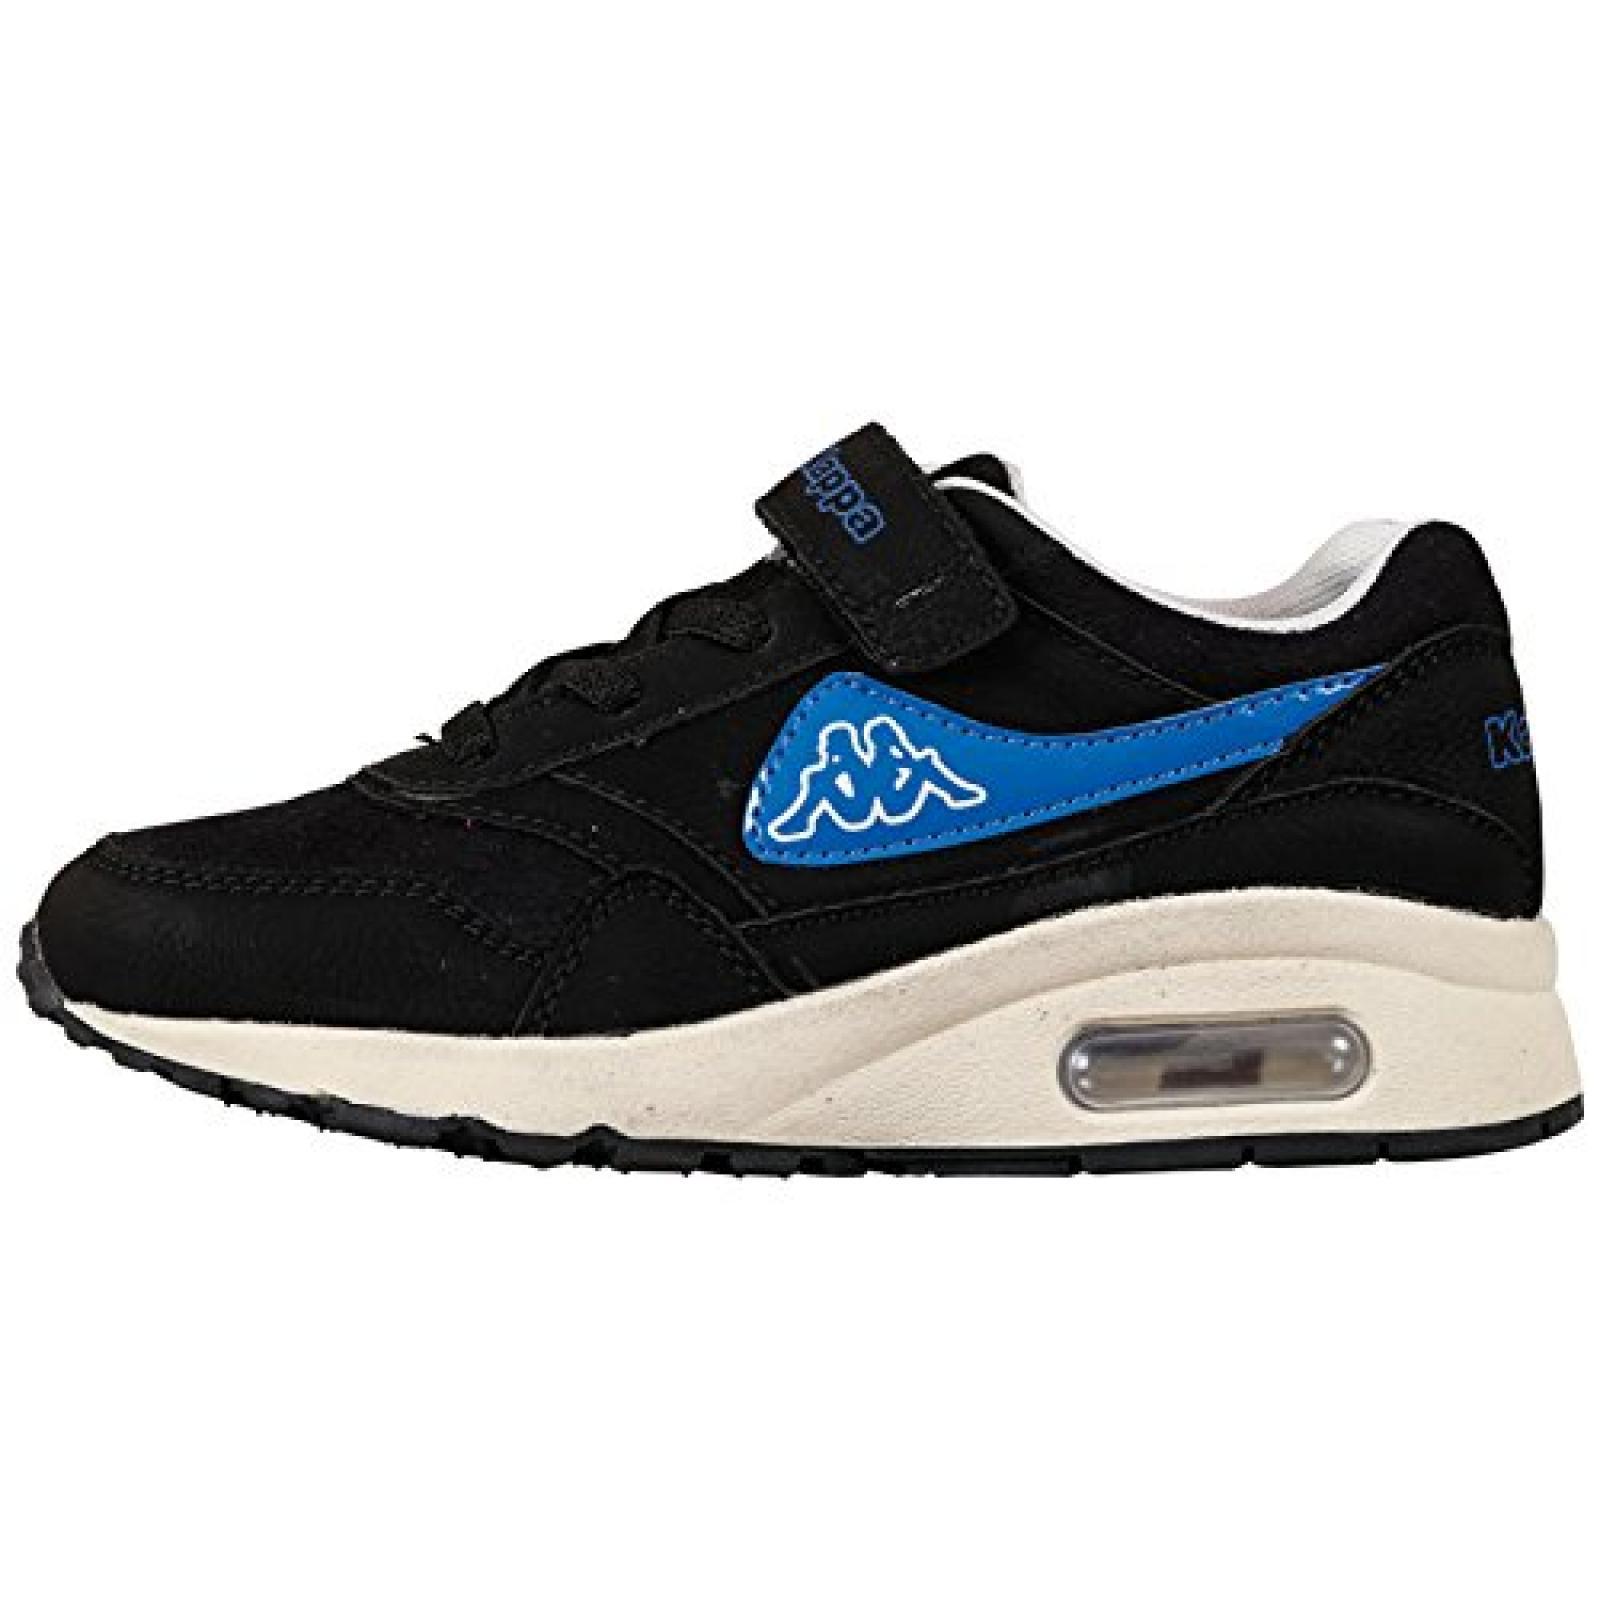 Kappa KONFEKT K Footwear Unisex-Kinder Sneakers